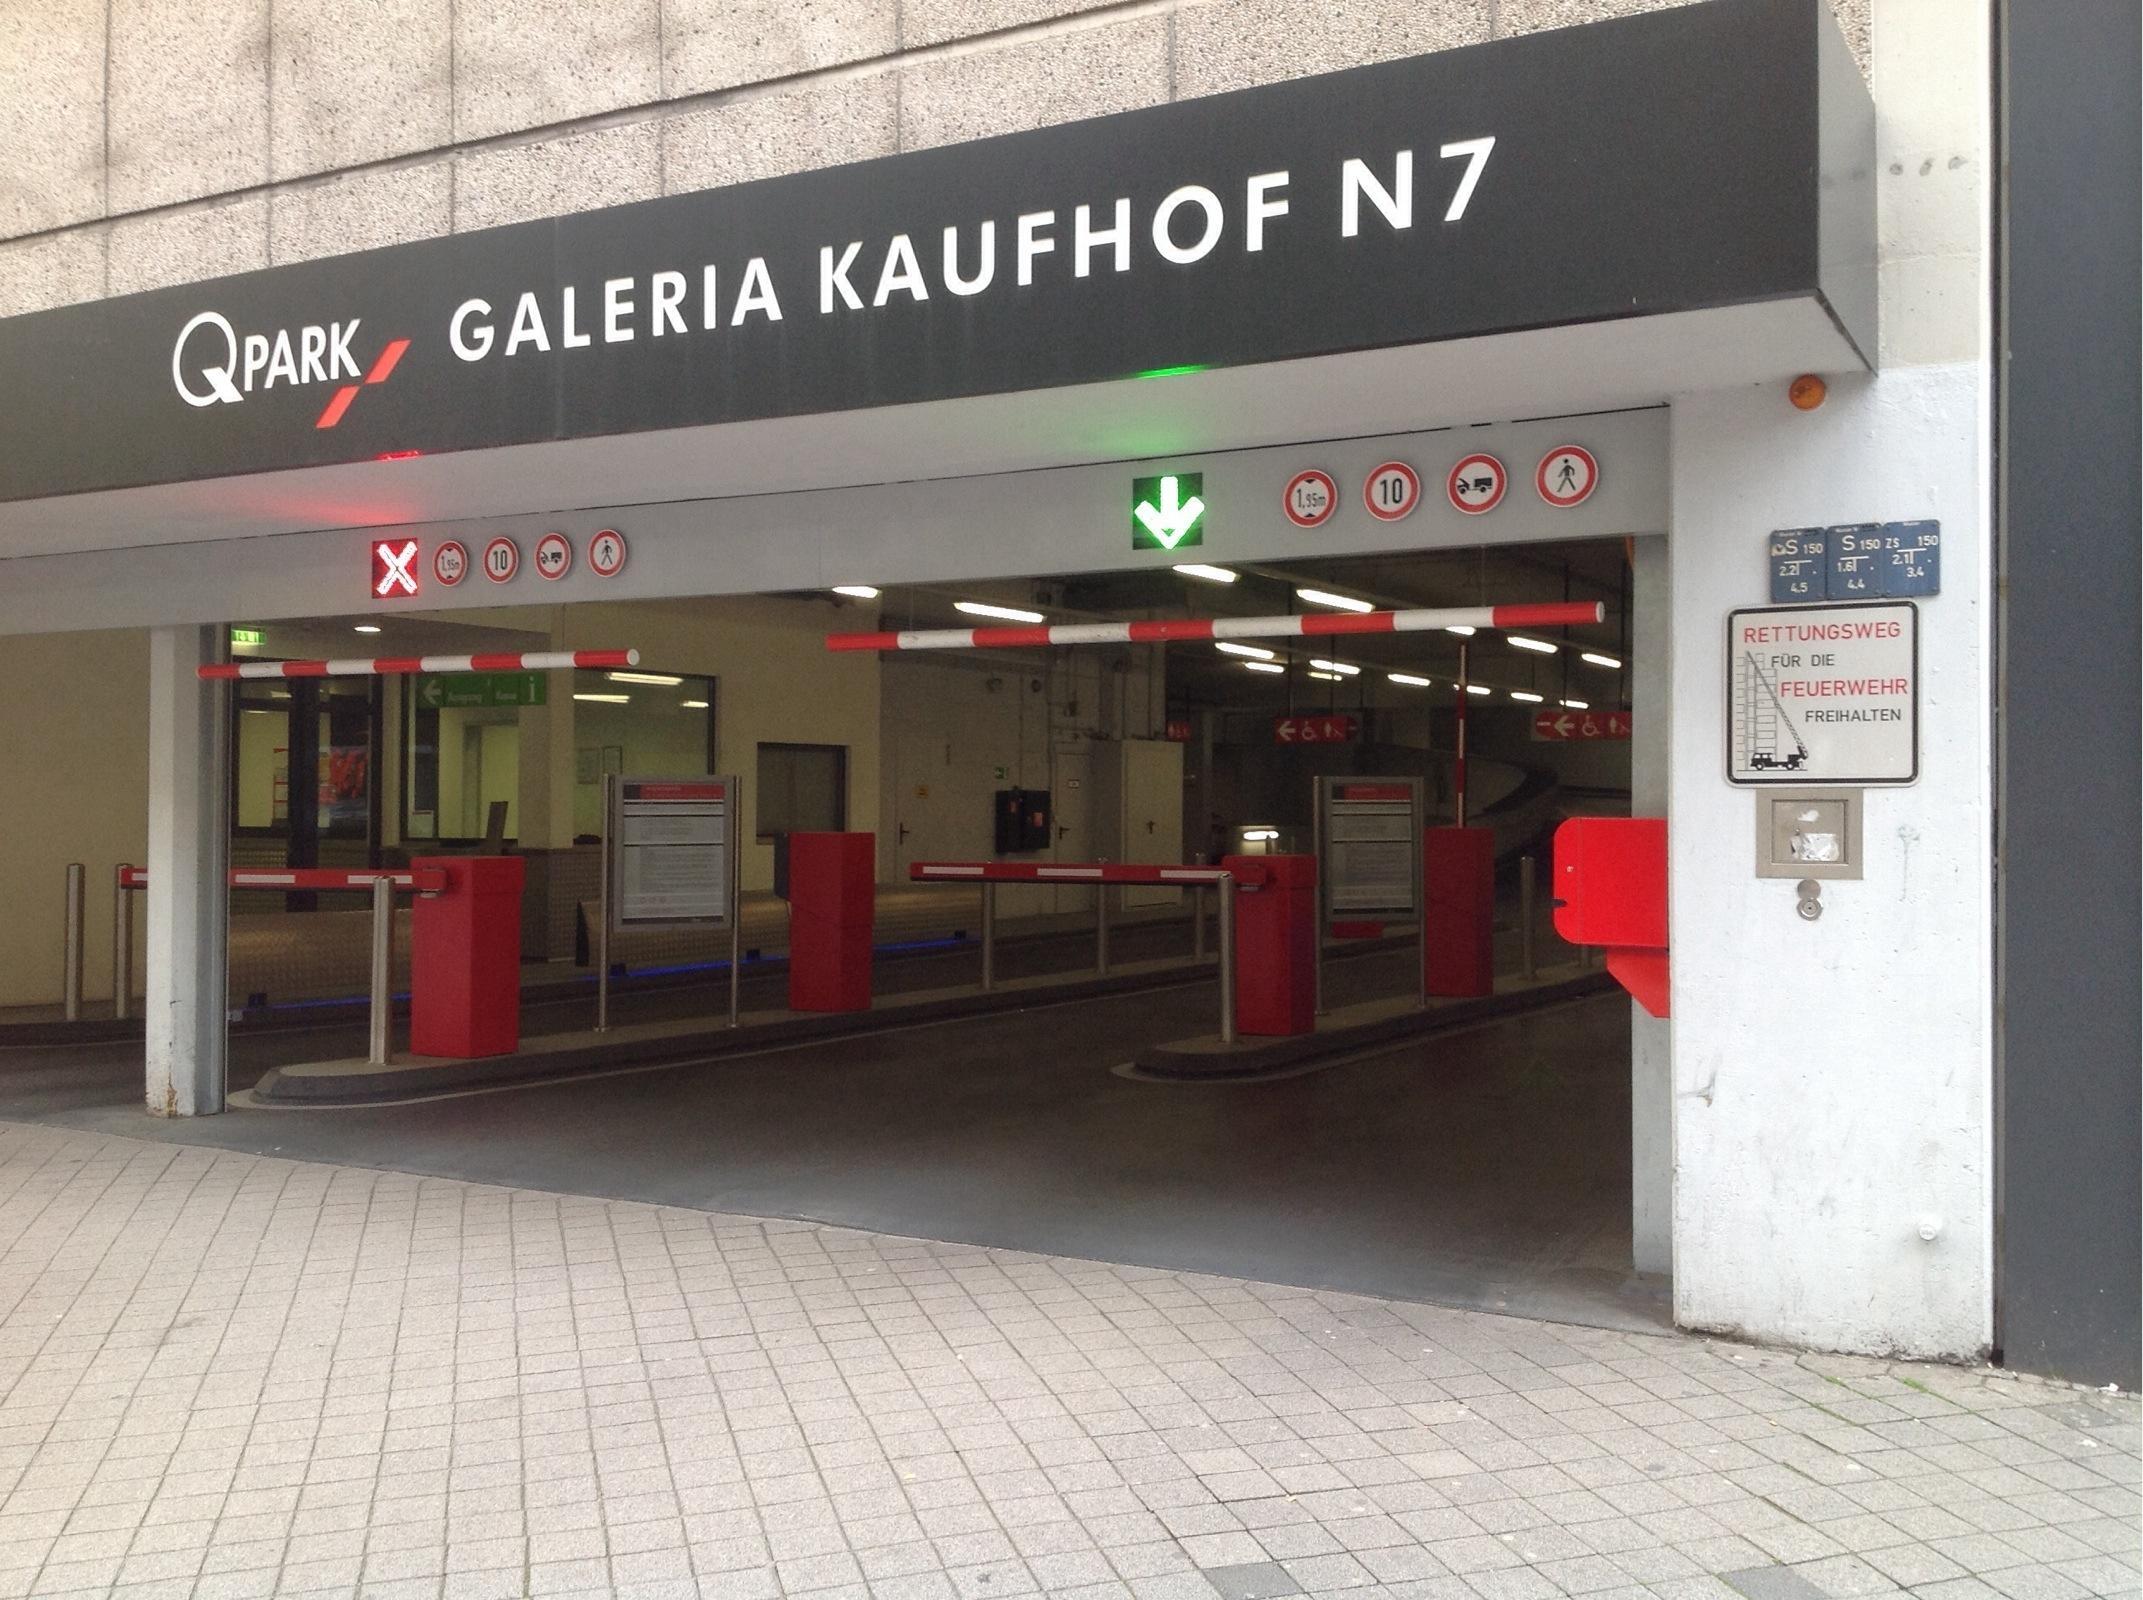 galeria kaufhof n7 parking in mannheim parkme. Black Bedroom Furniture Sets. Home Design Ideas